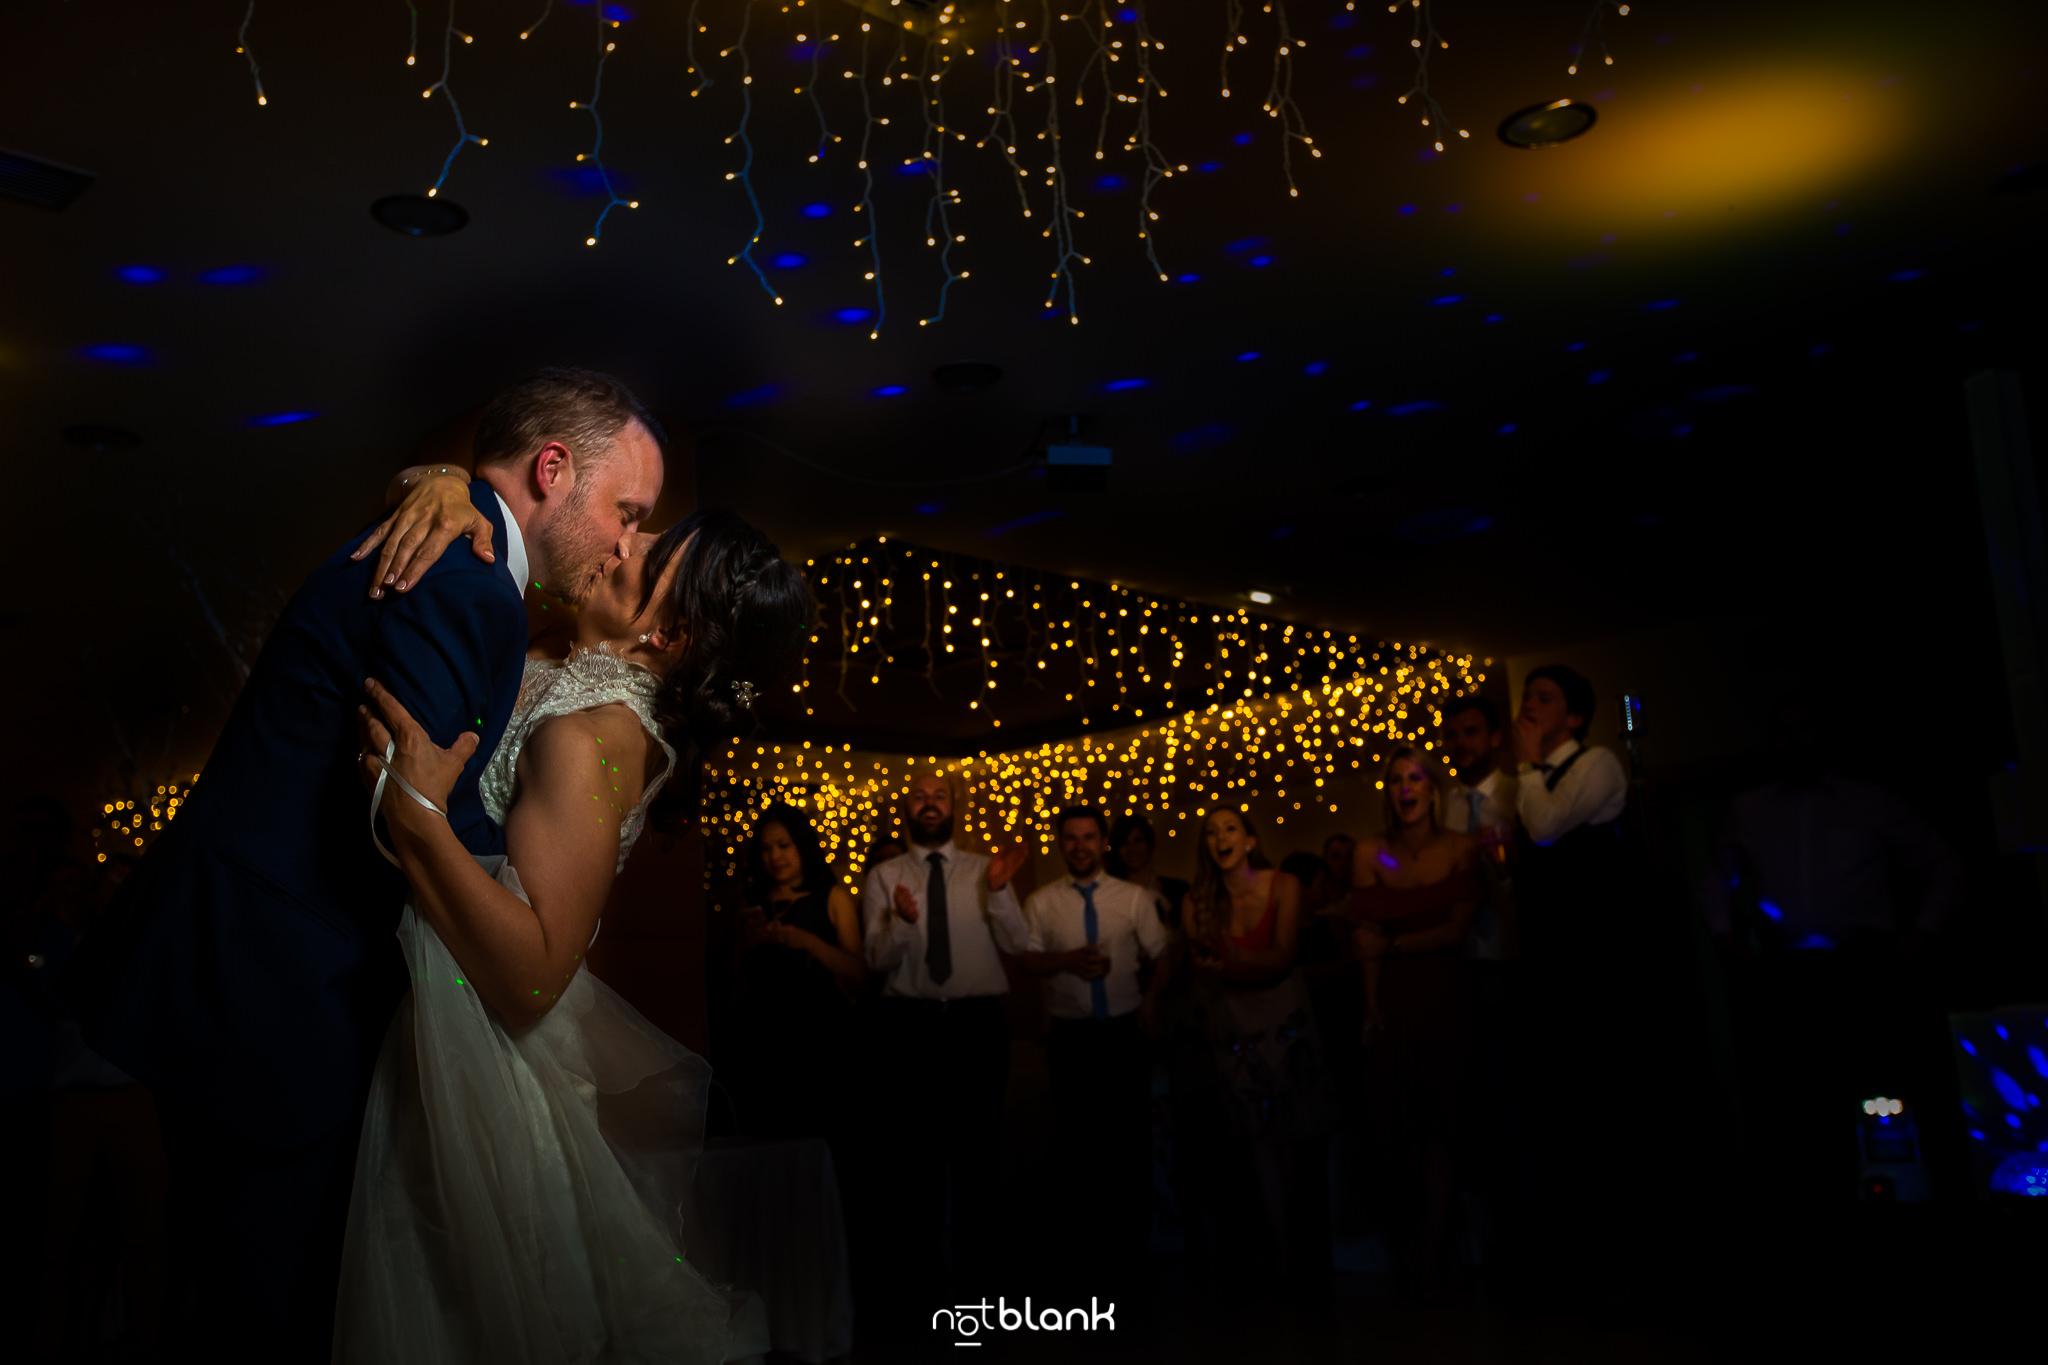 Boda-Maite-David-Novios-Besandose-Durante-Primer-Baile. Reportaje realizado por Notblank fotógrafos de boda